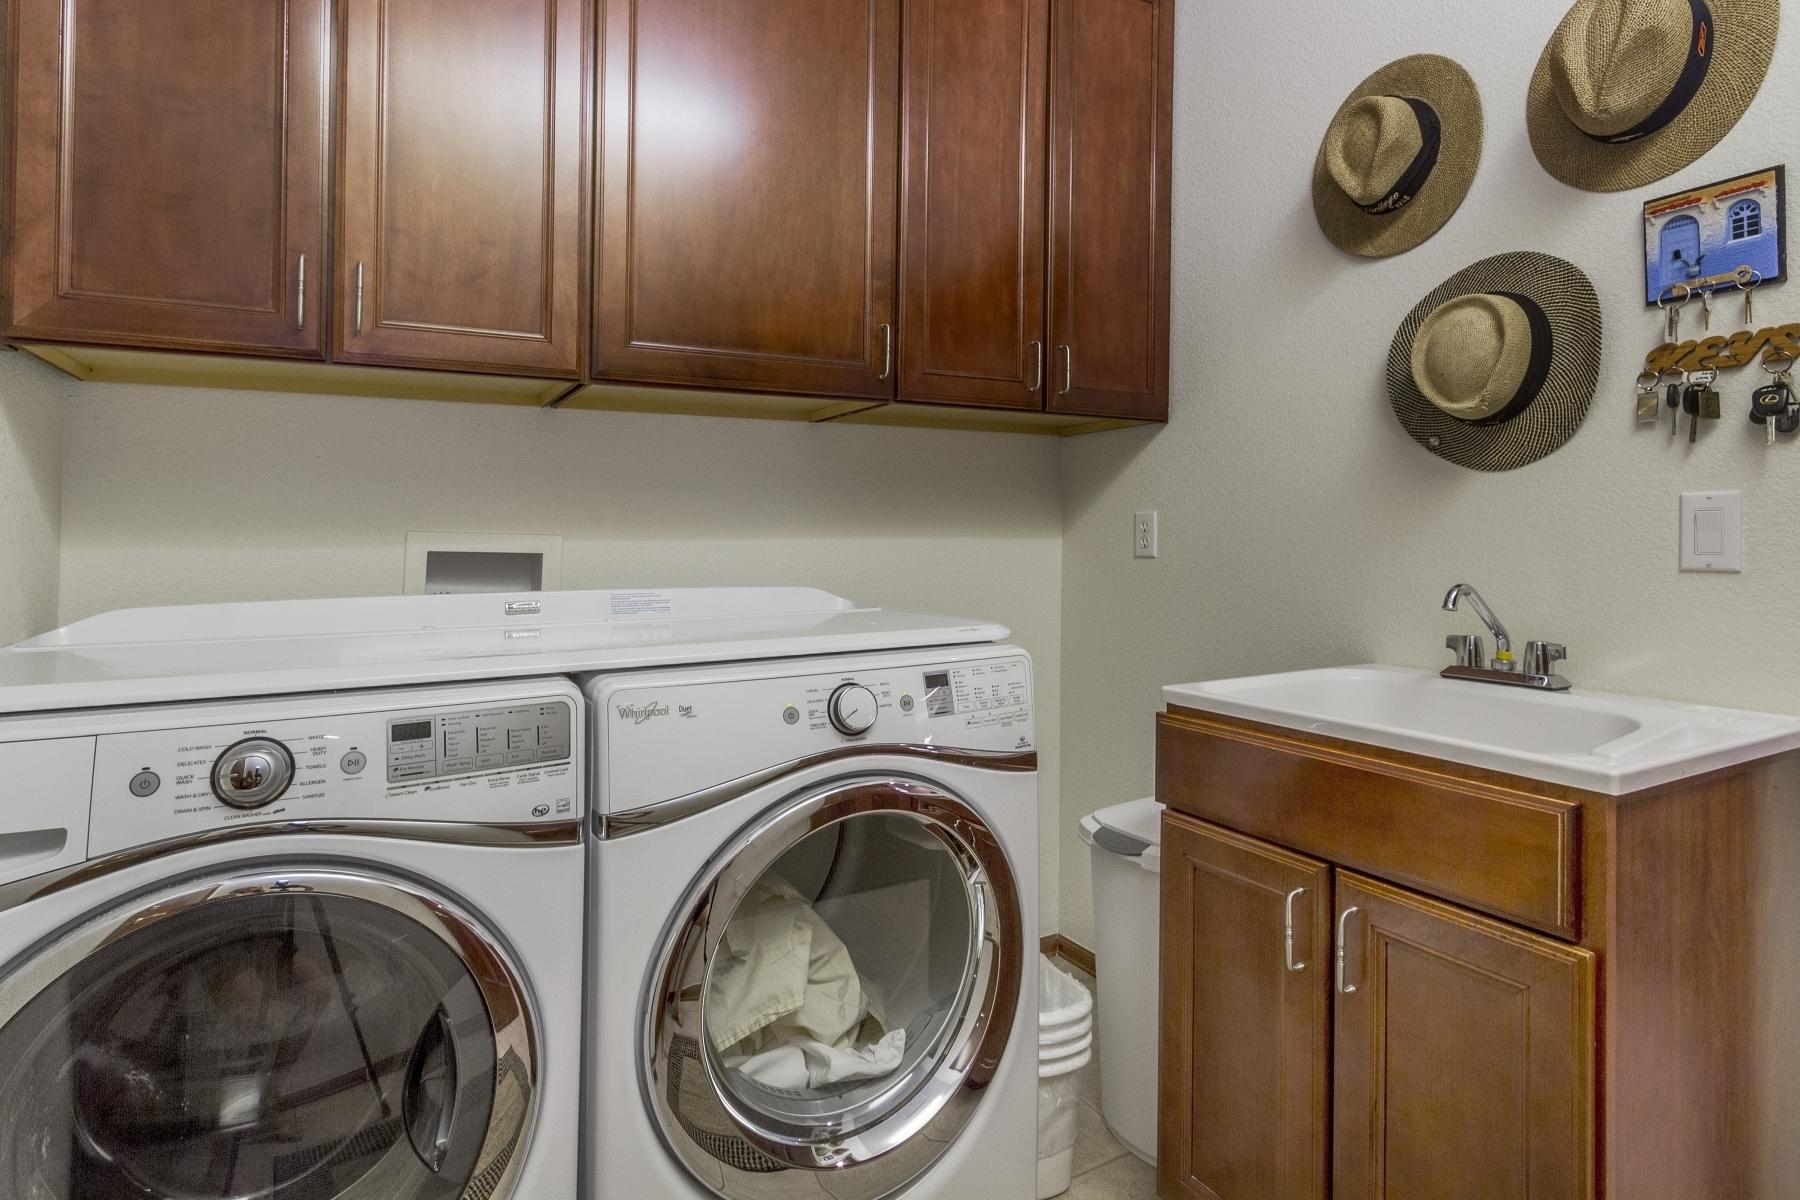 Laundry-Room_1800x1200_2762651.jpg